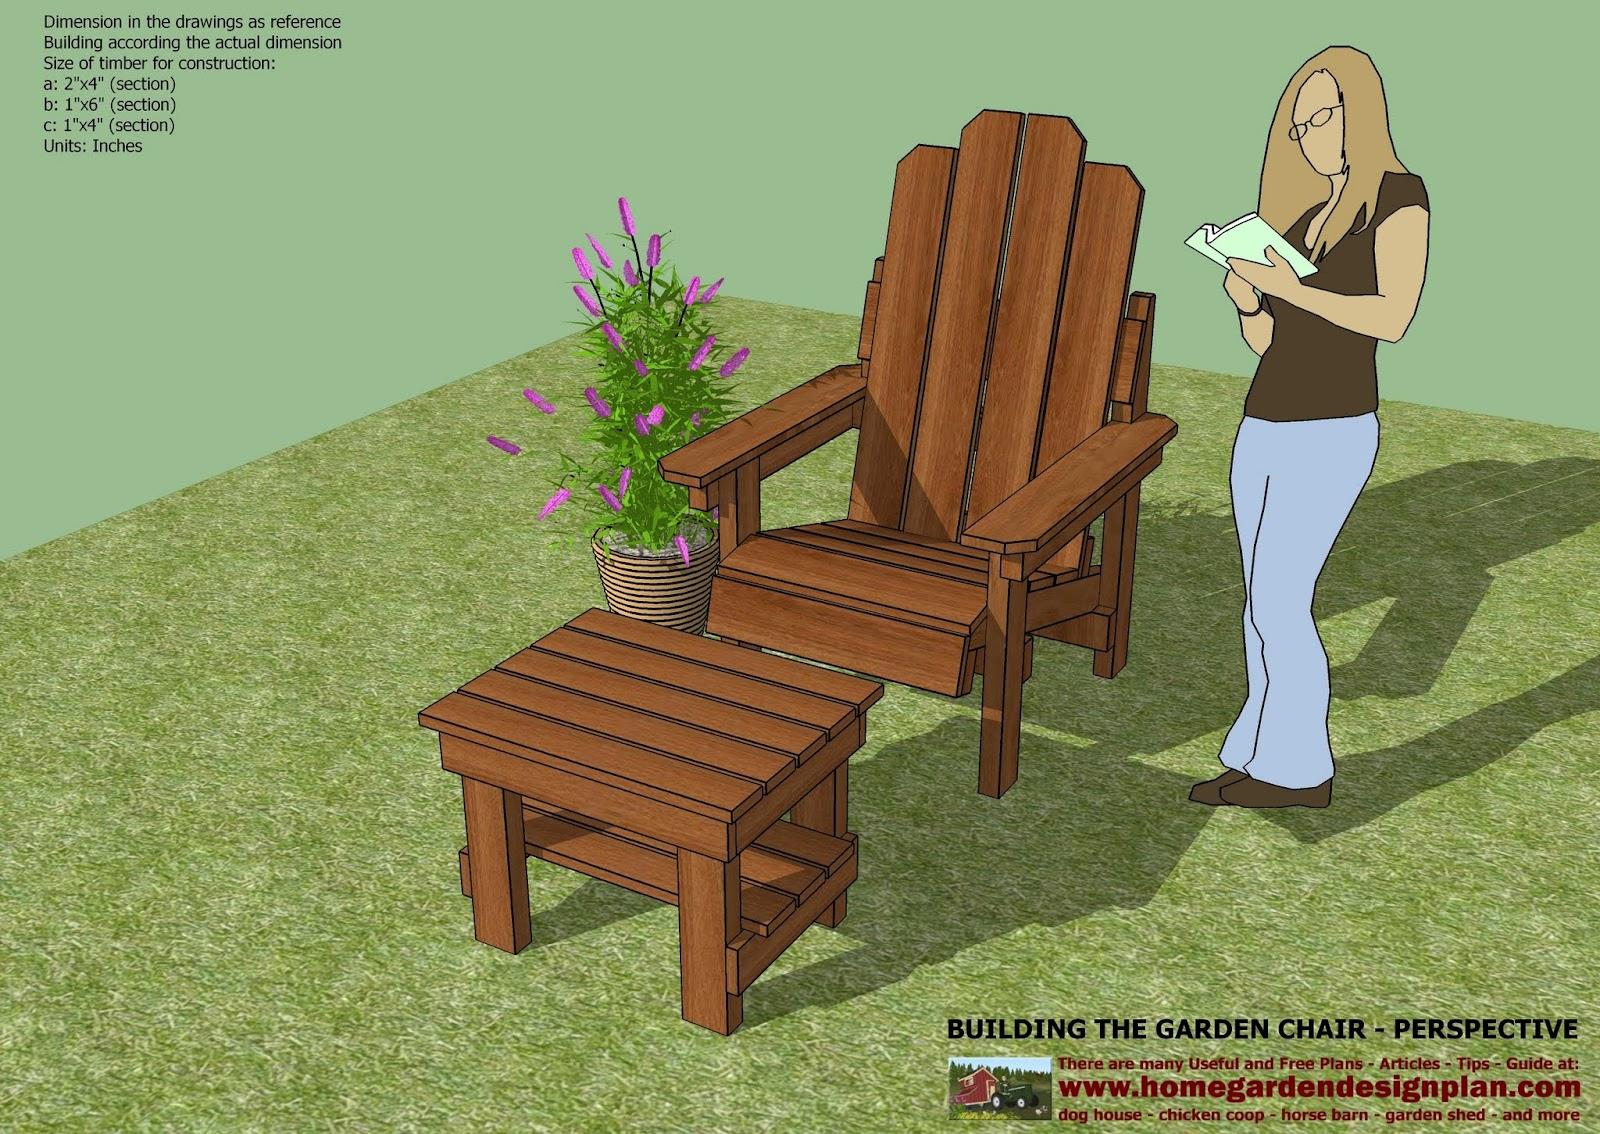 home garden plans GC100 Garden Chair Plans Out Door Furniture – Free Garden Bench Plans Woodworking